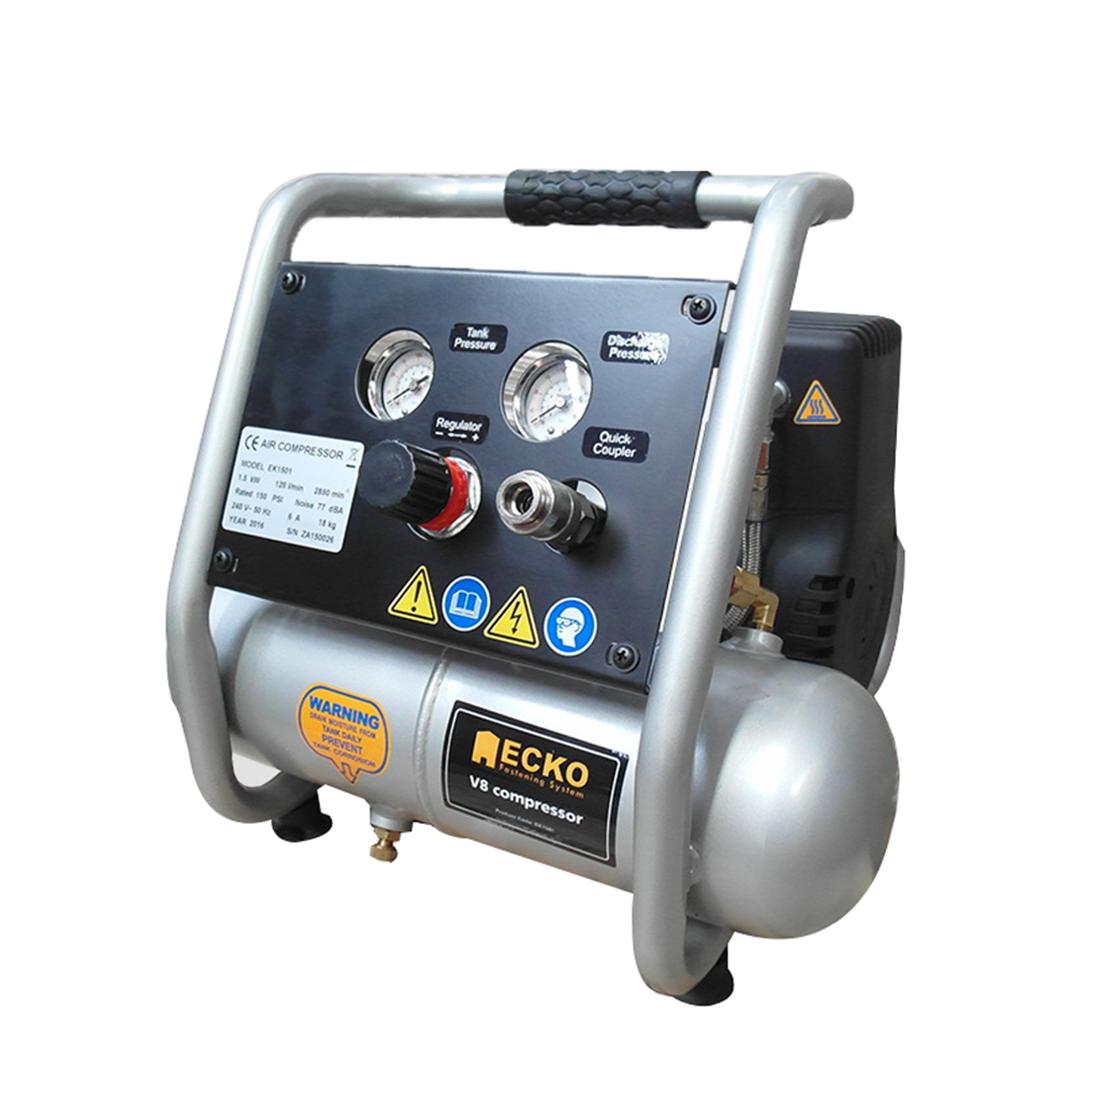 Hammahand 1.5hp Light Weight V8 Compressor